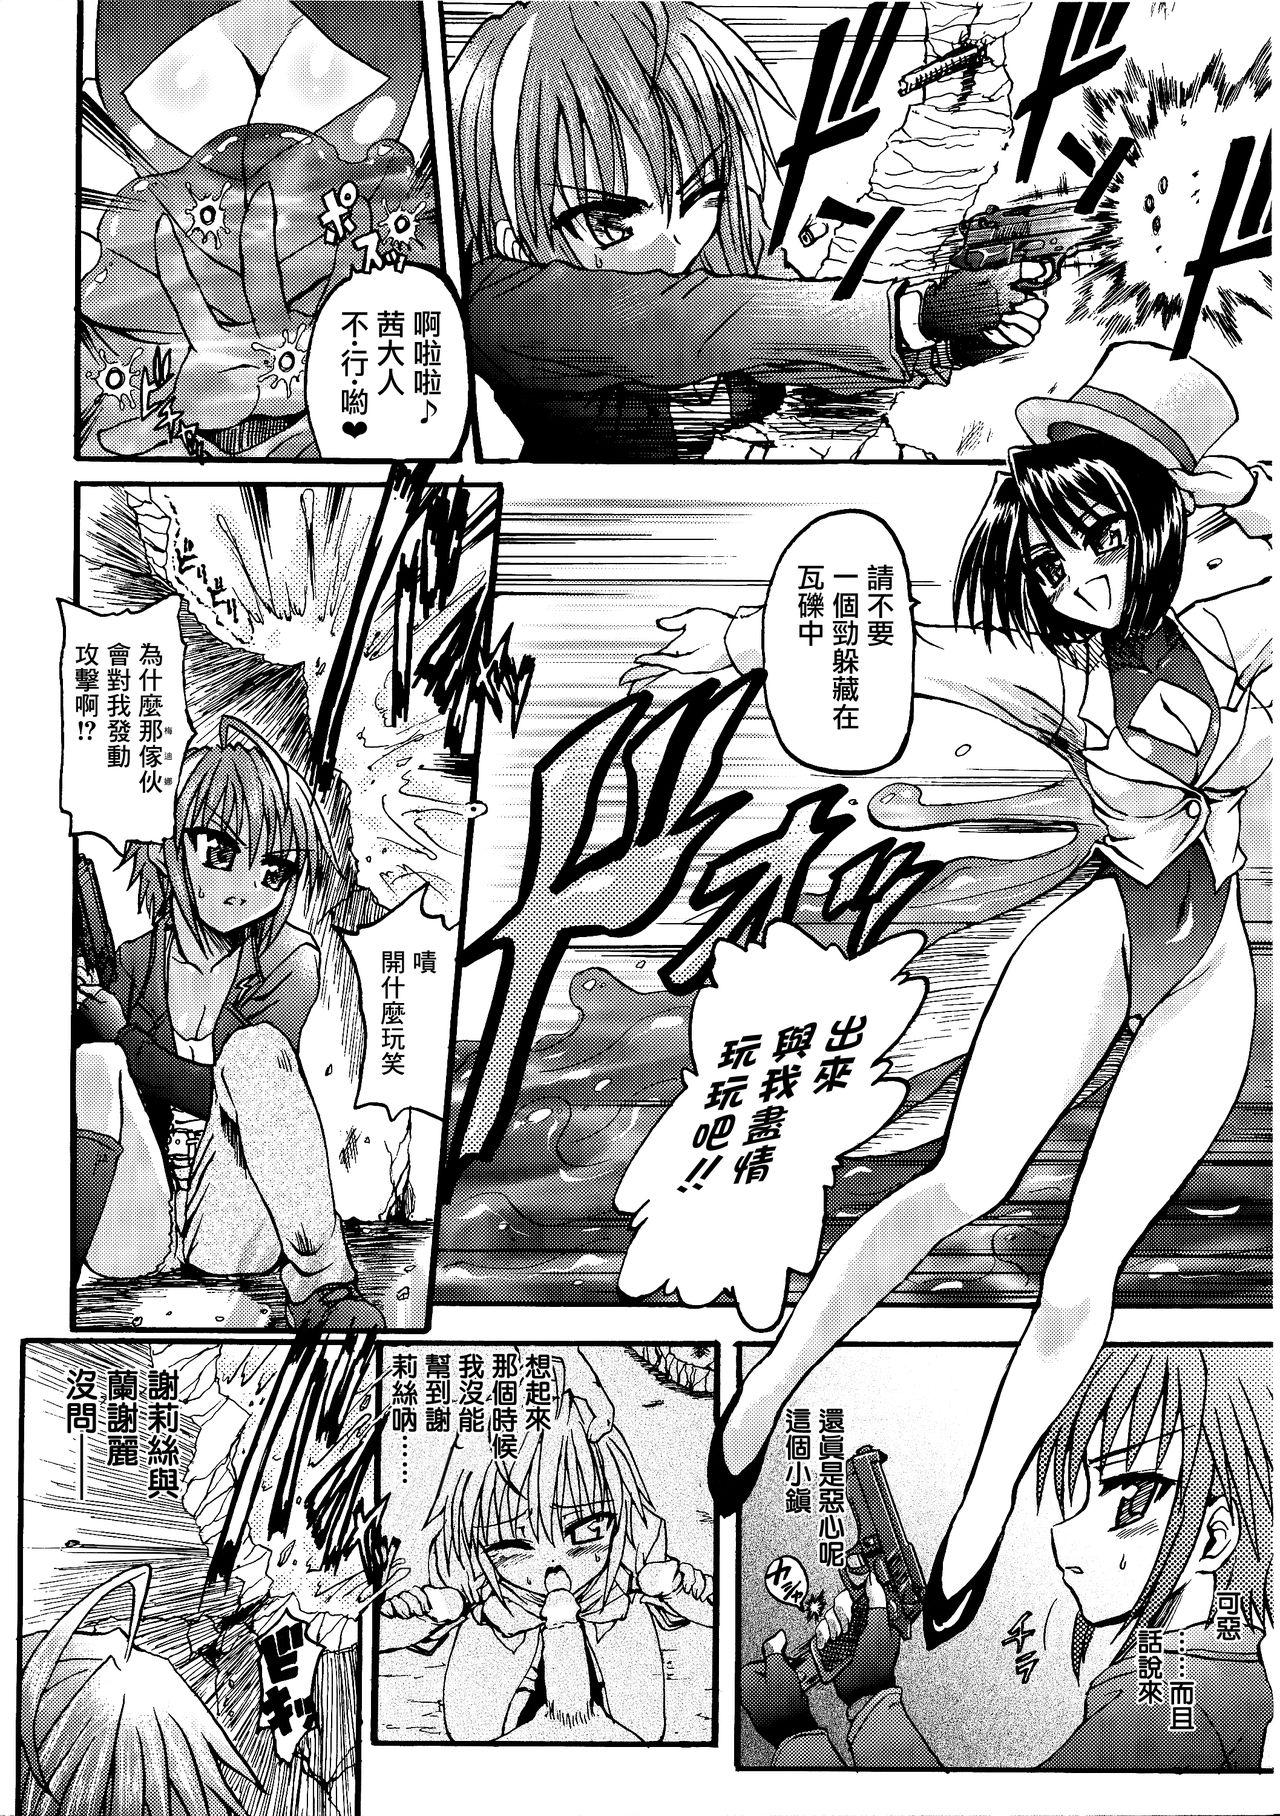 Ma ga Ochiru Yoru Demonic Imitator CH.1-7 12